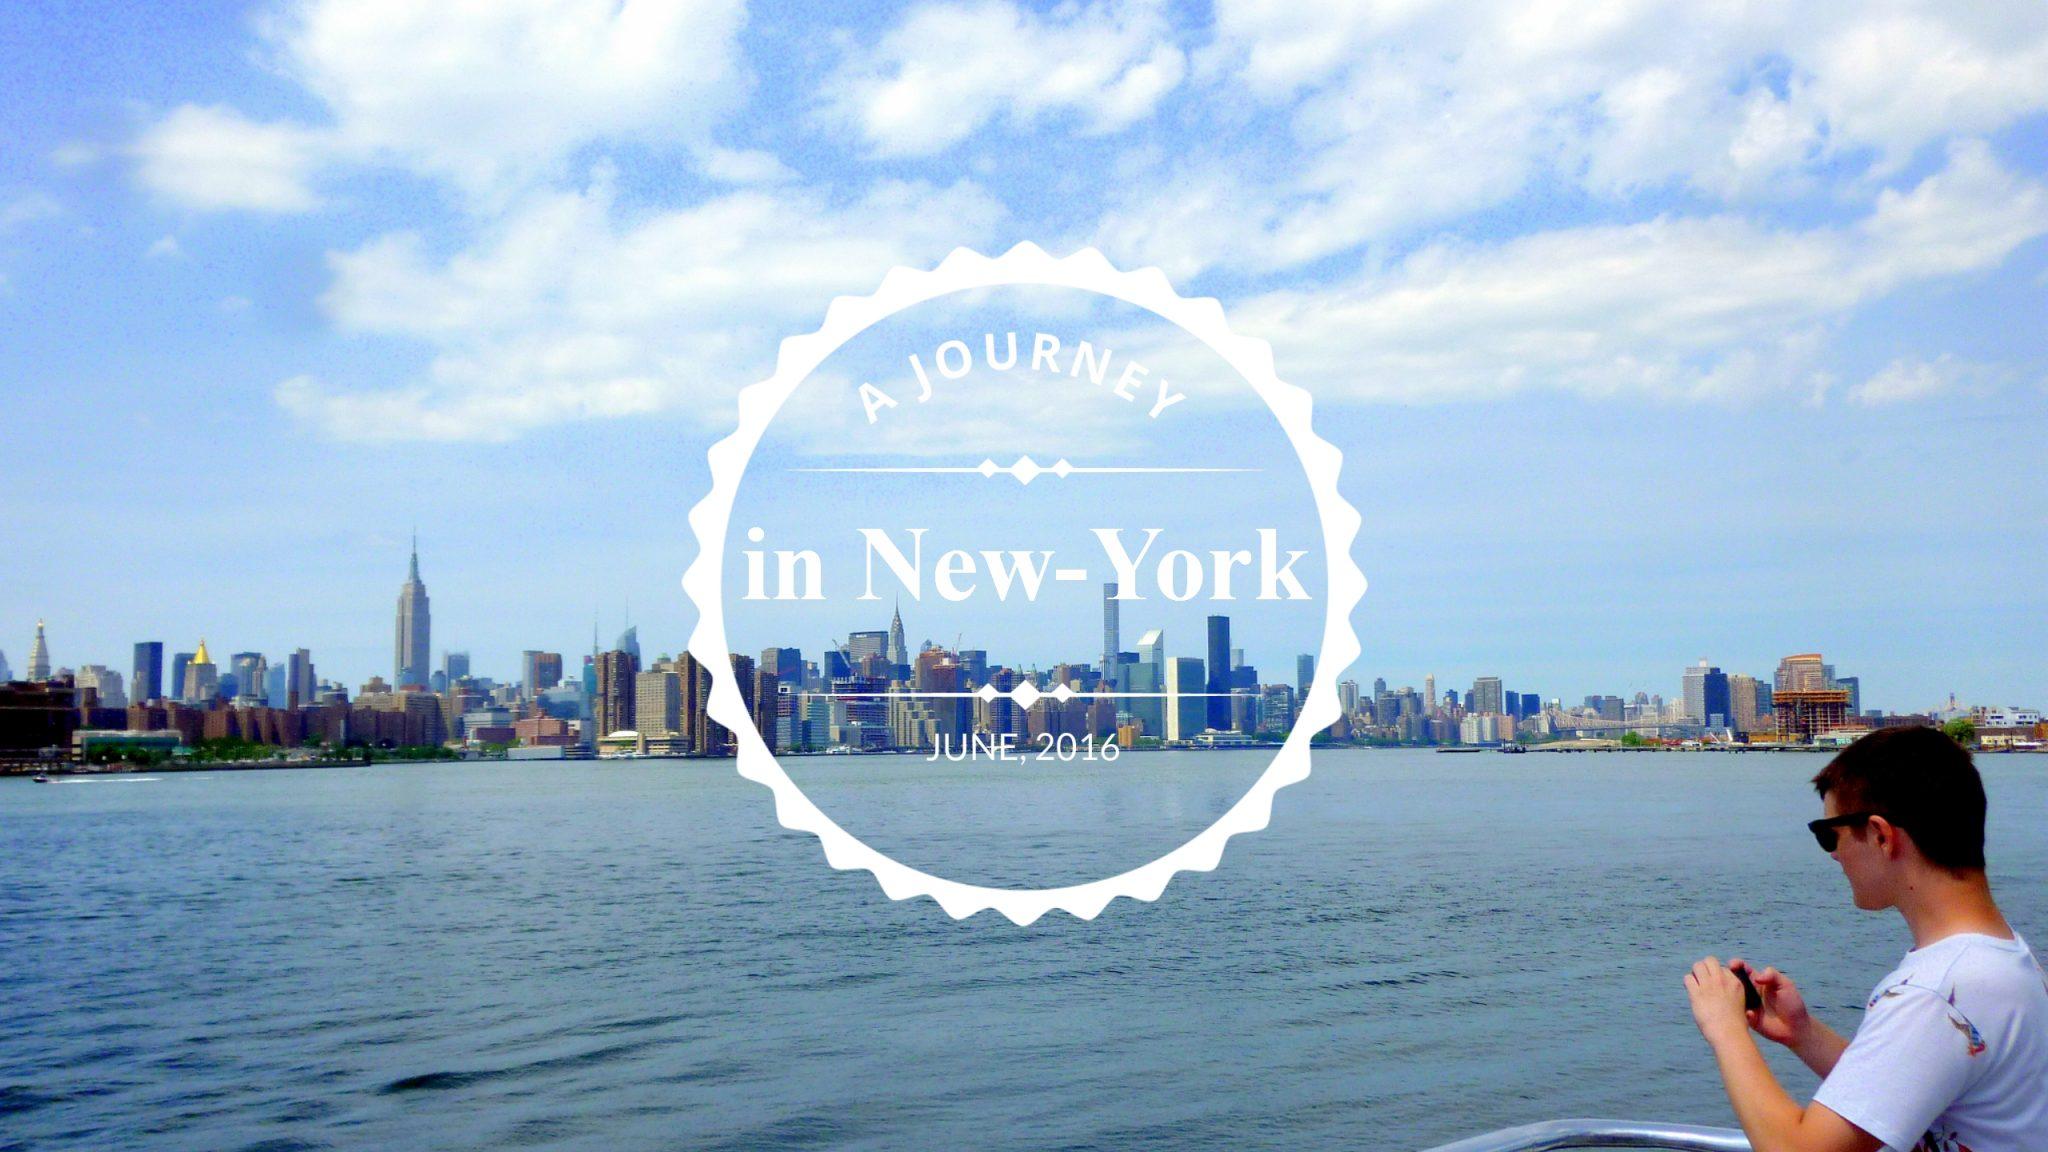 voyage-new-york